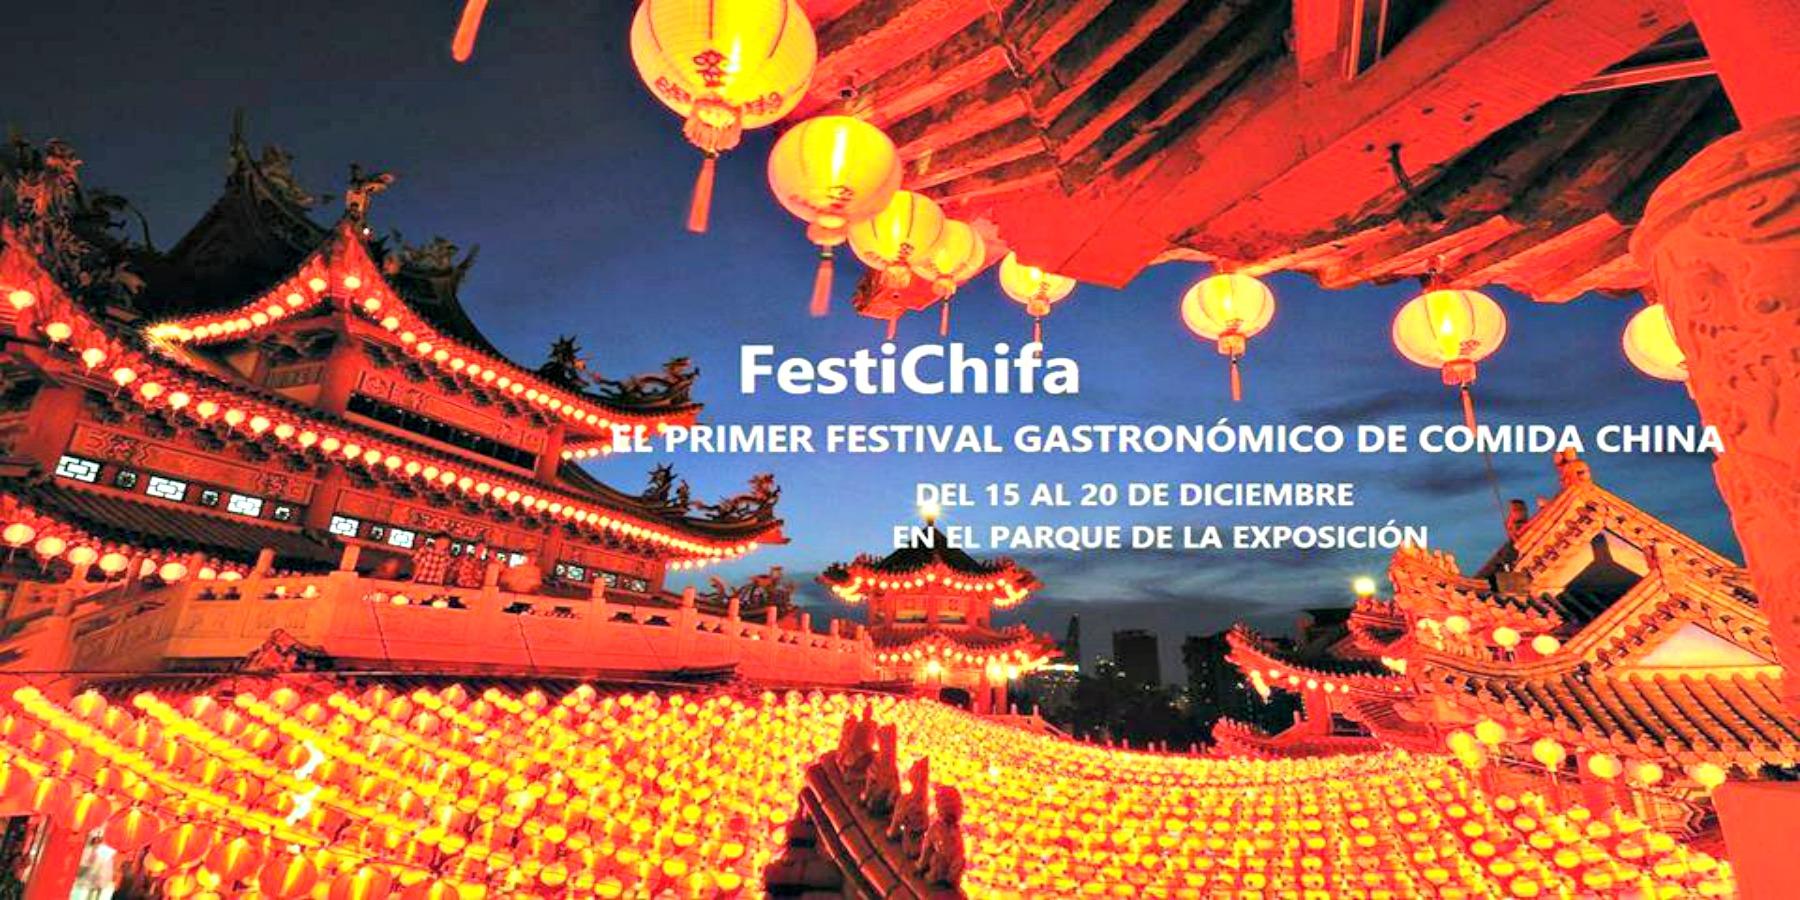 FestiChifa | El Primer Festival Gastronómico de Comida China